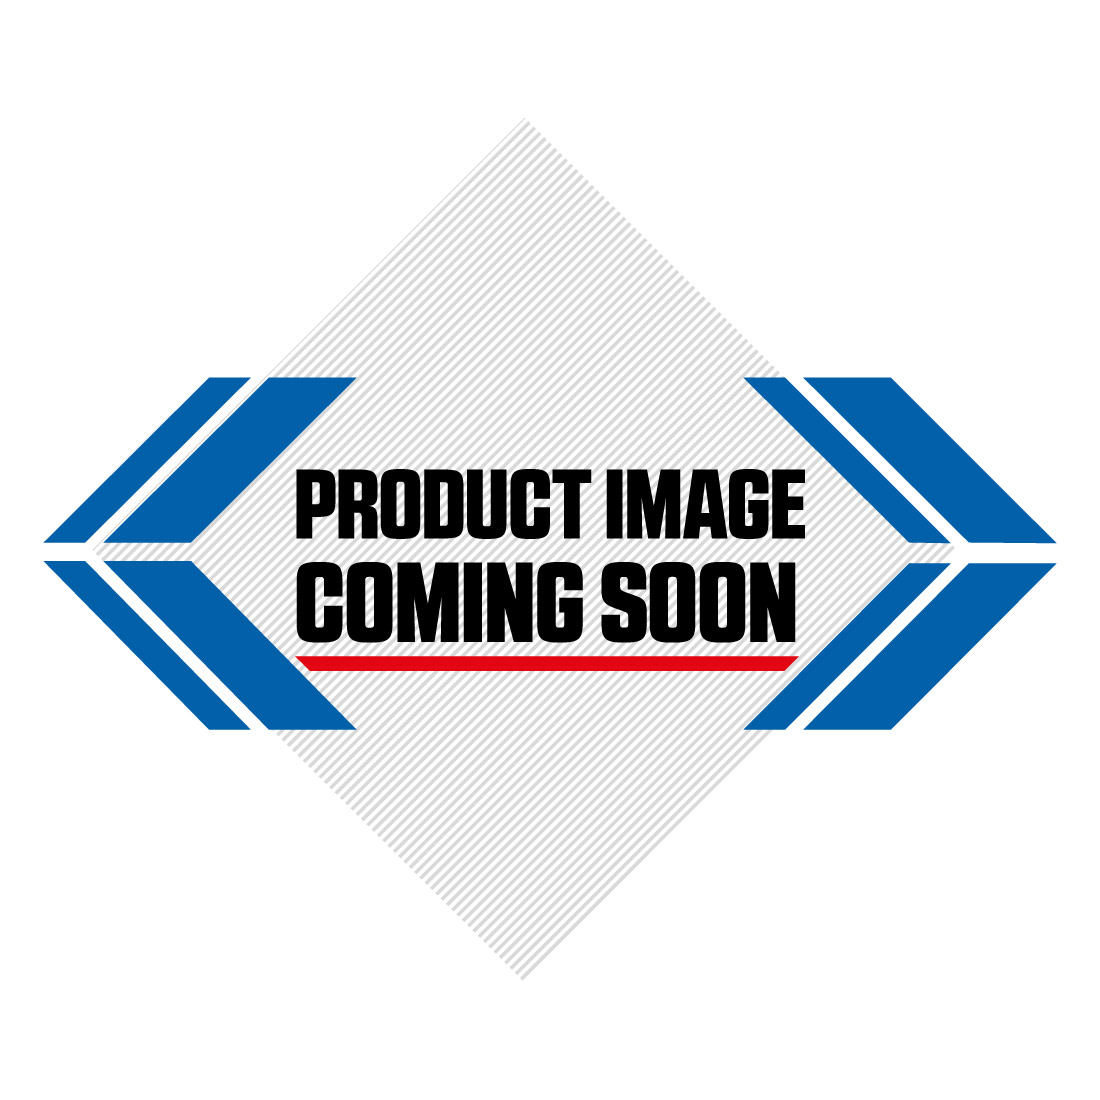 Suzuki Plastic Kit RMZ 450 (11-12) OEM Factory Image-2